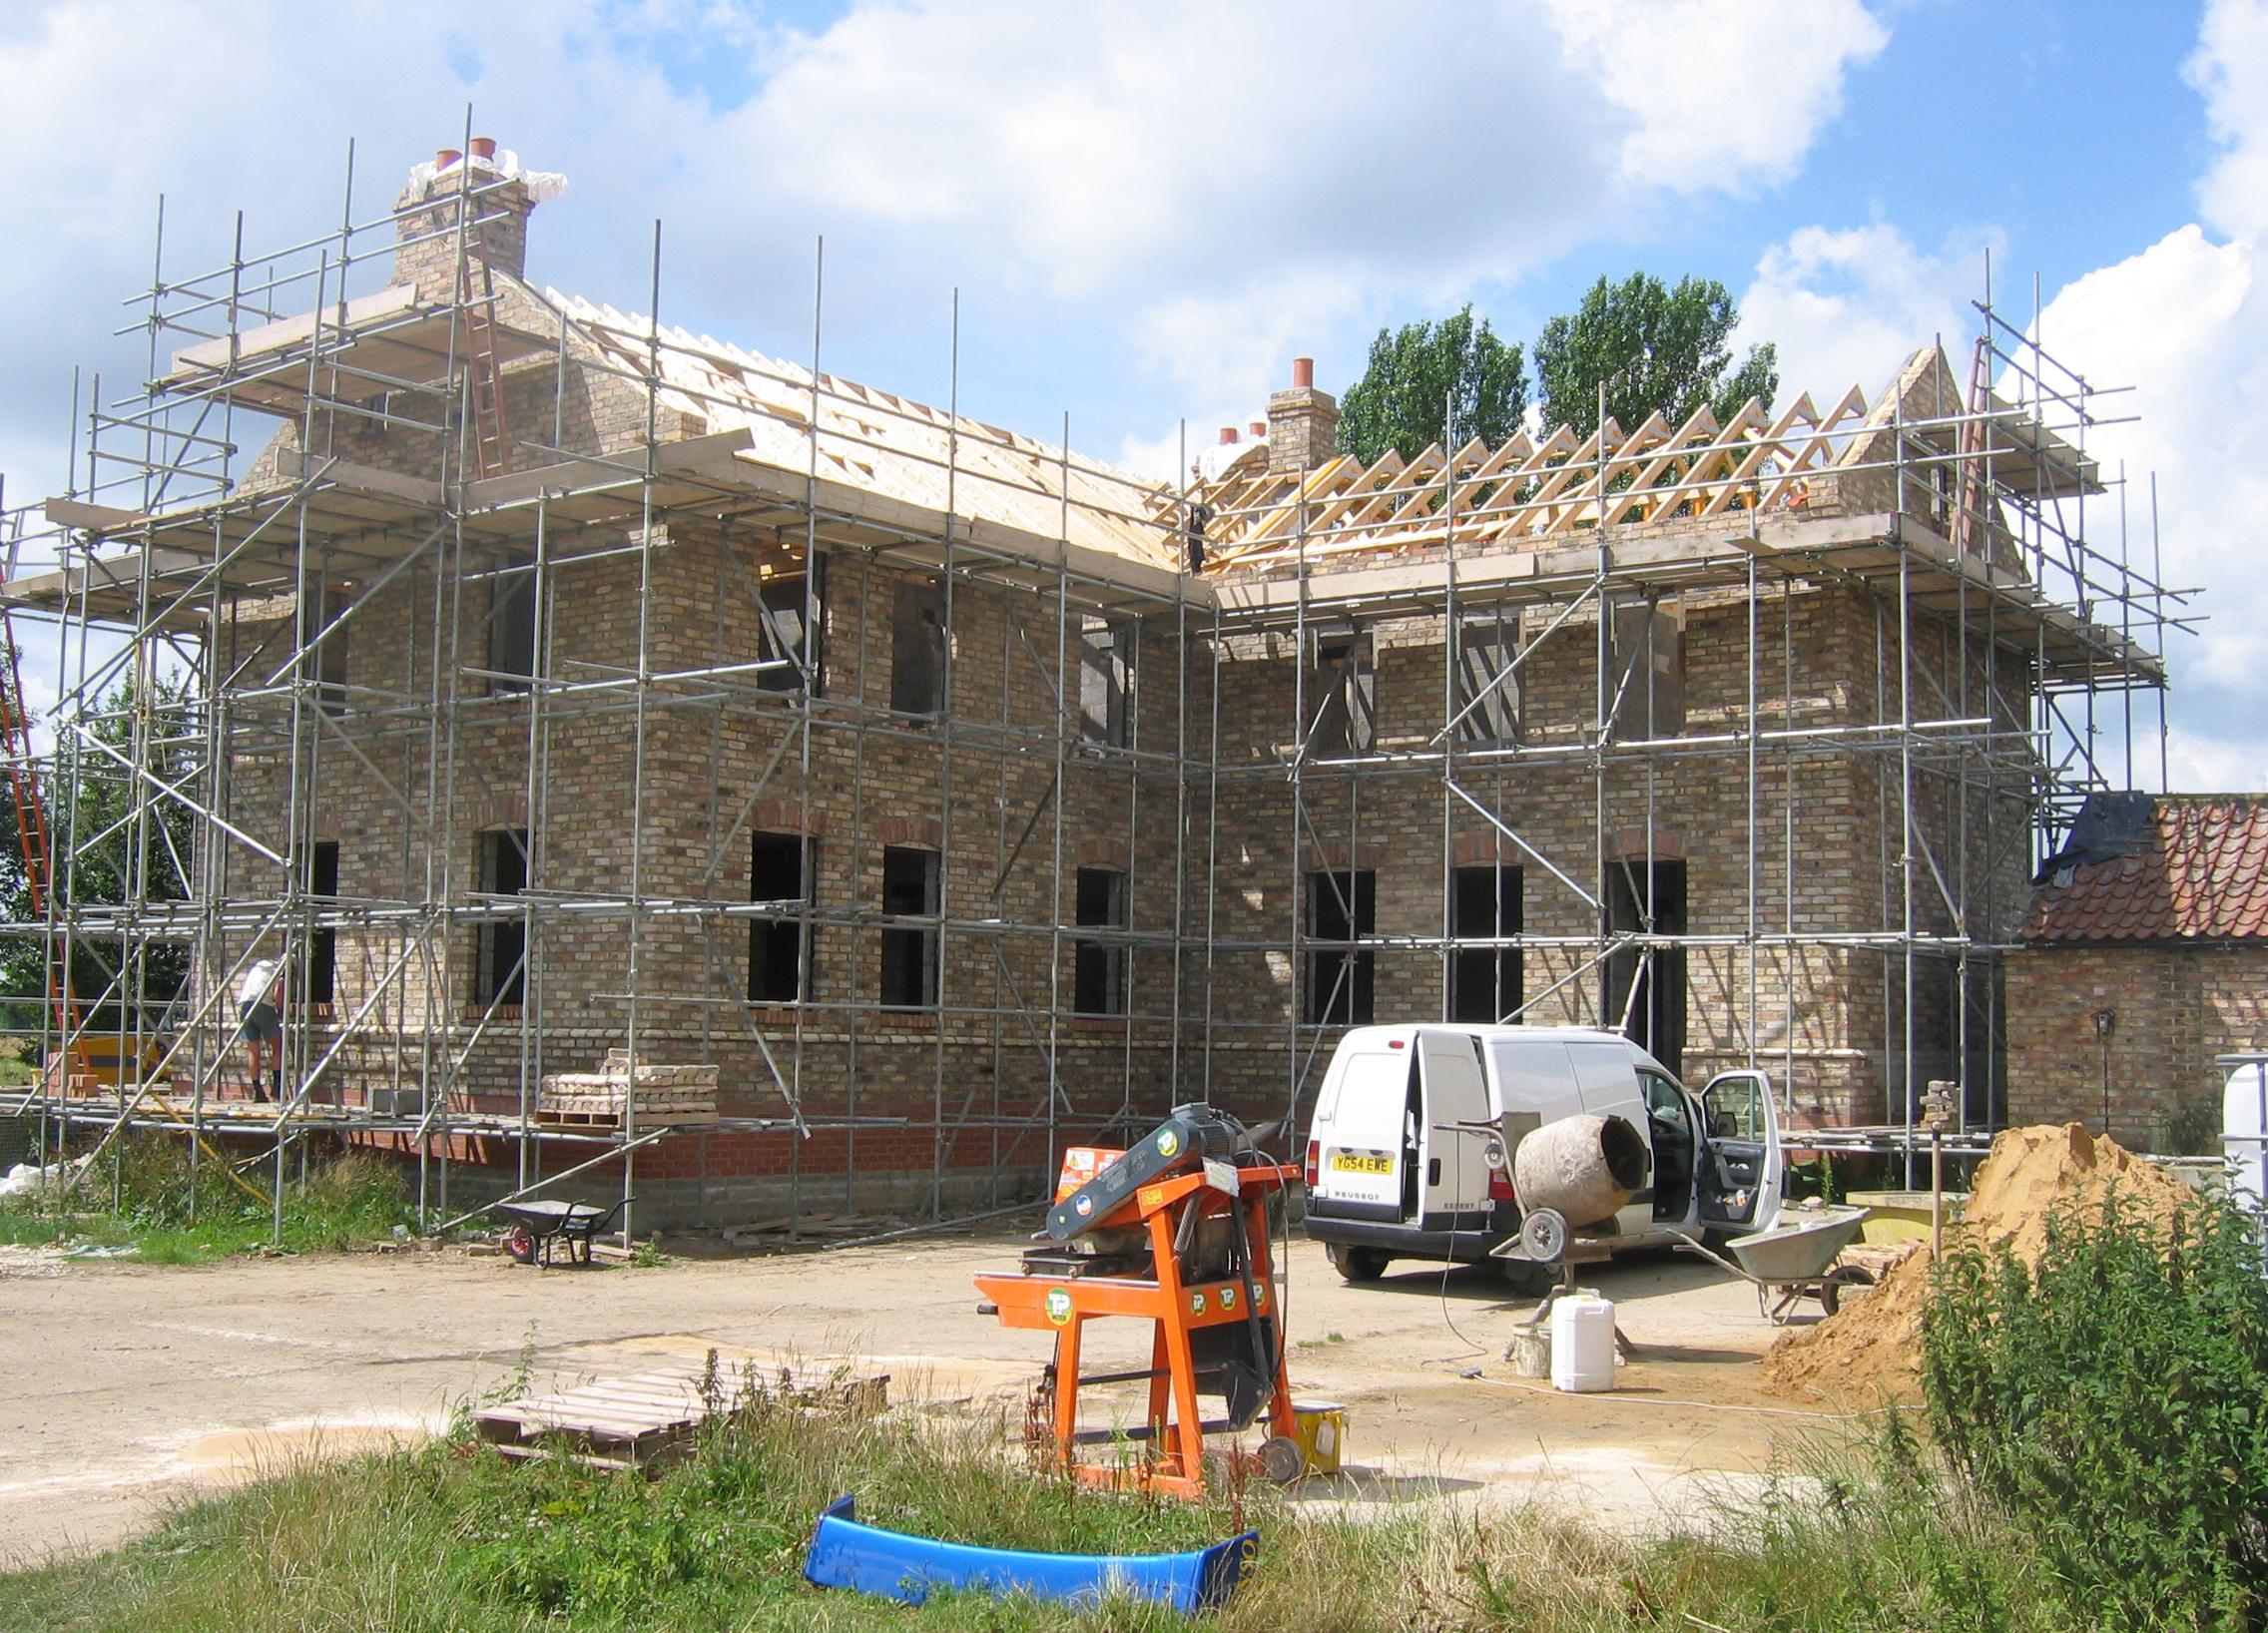 Rascal Wood Construction 12 - East Yorkshire Architects - Samuel Kendall Associates.JPG